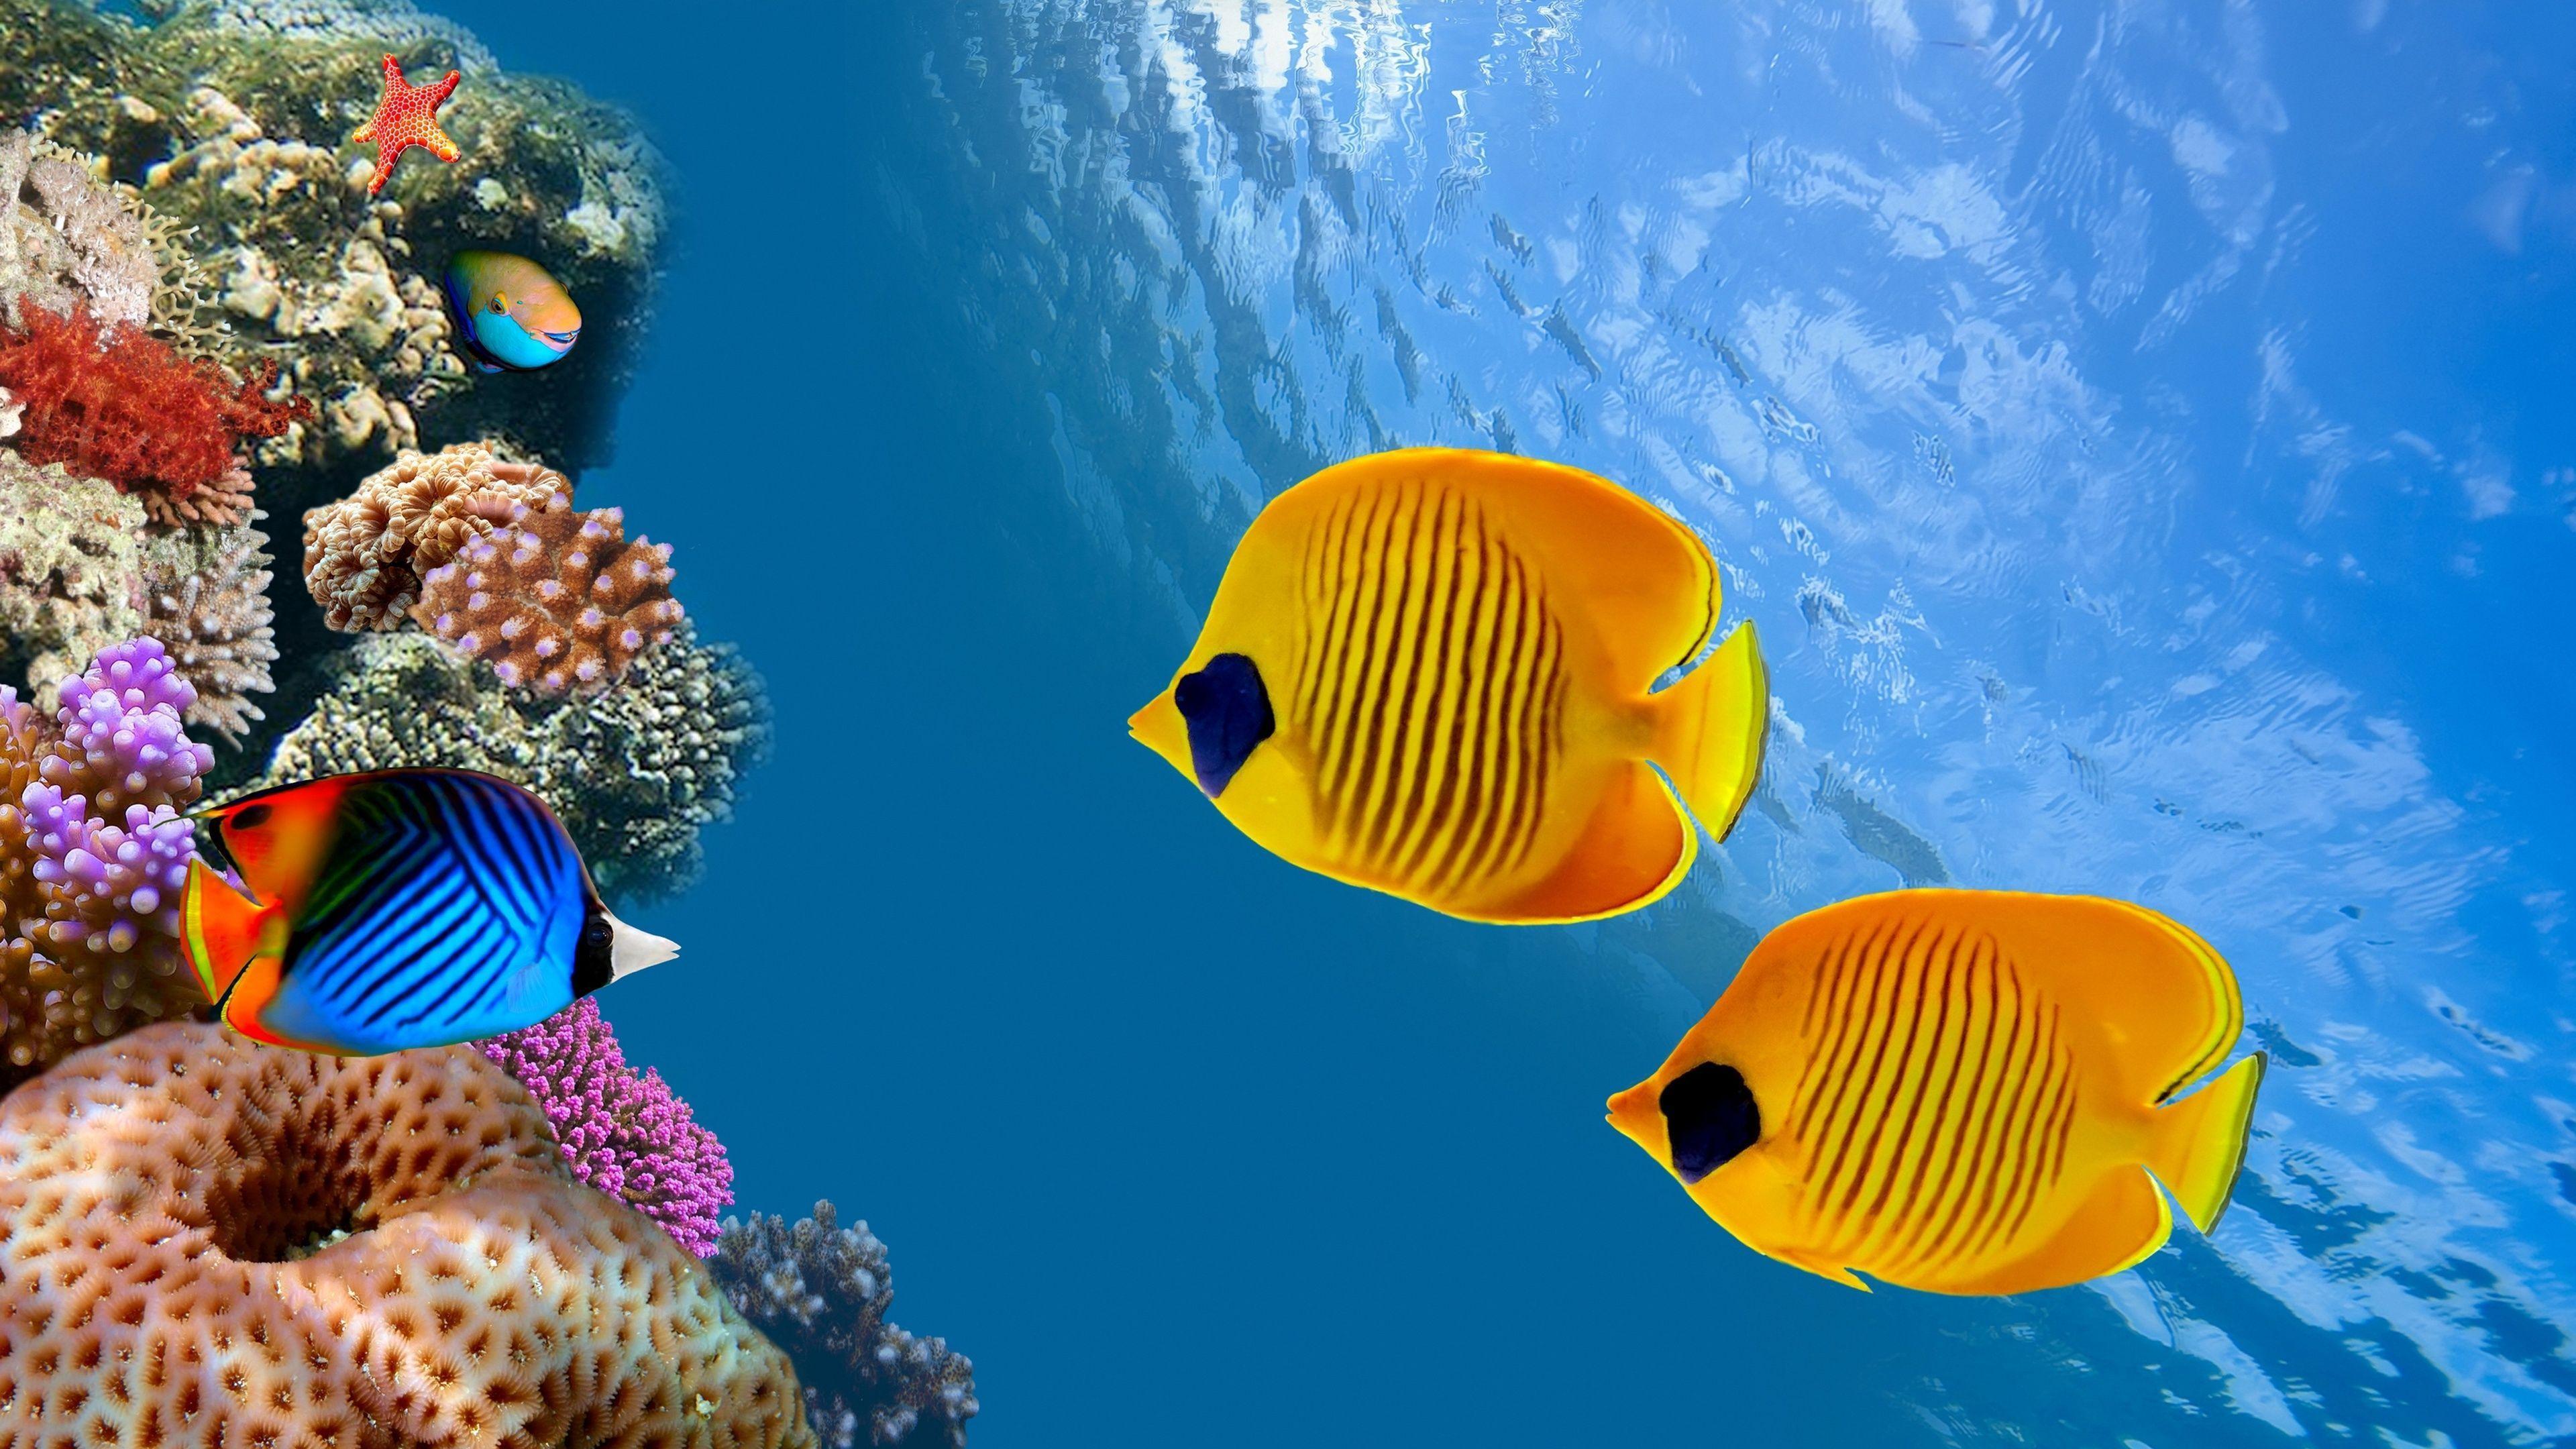 Aquarium 4k Uhd Wallpapers Top Free Aquarium 4k Uhd Backgrounds Wallpaperaccess